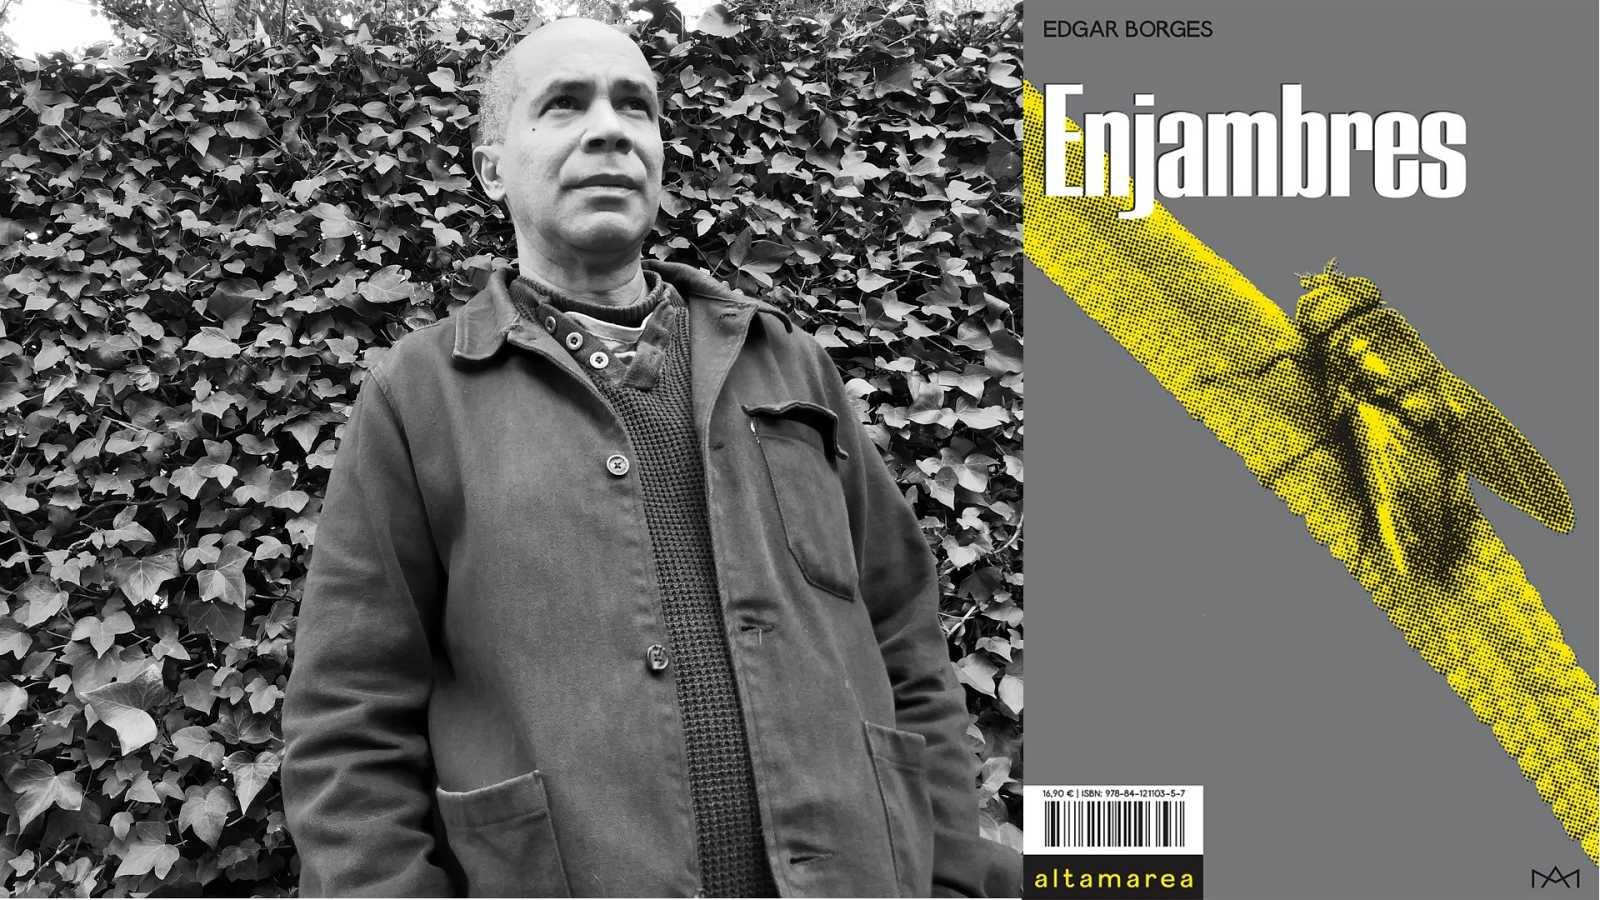 La LiBéLuLa - Enjambres (edgar Borges, ed. Altamarea) - 29/05/20 - escuchar ahora